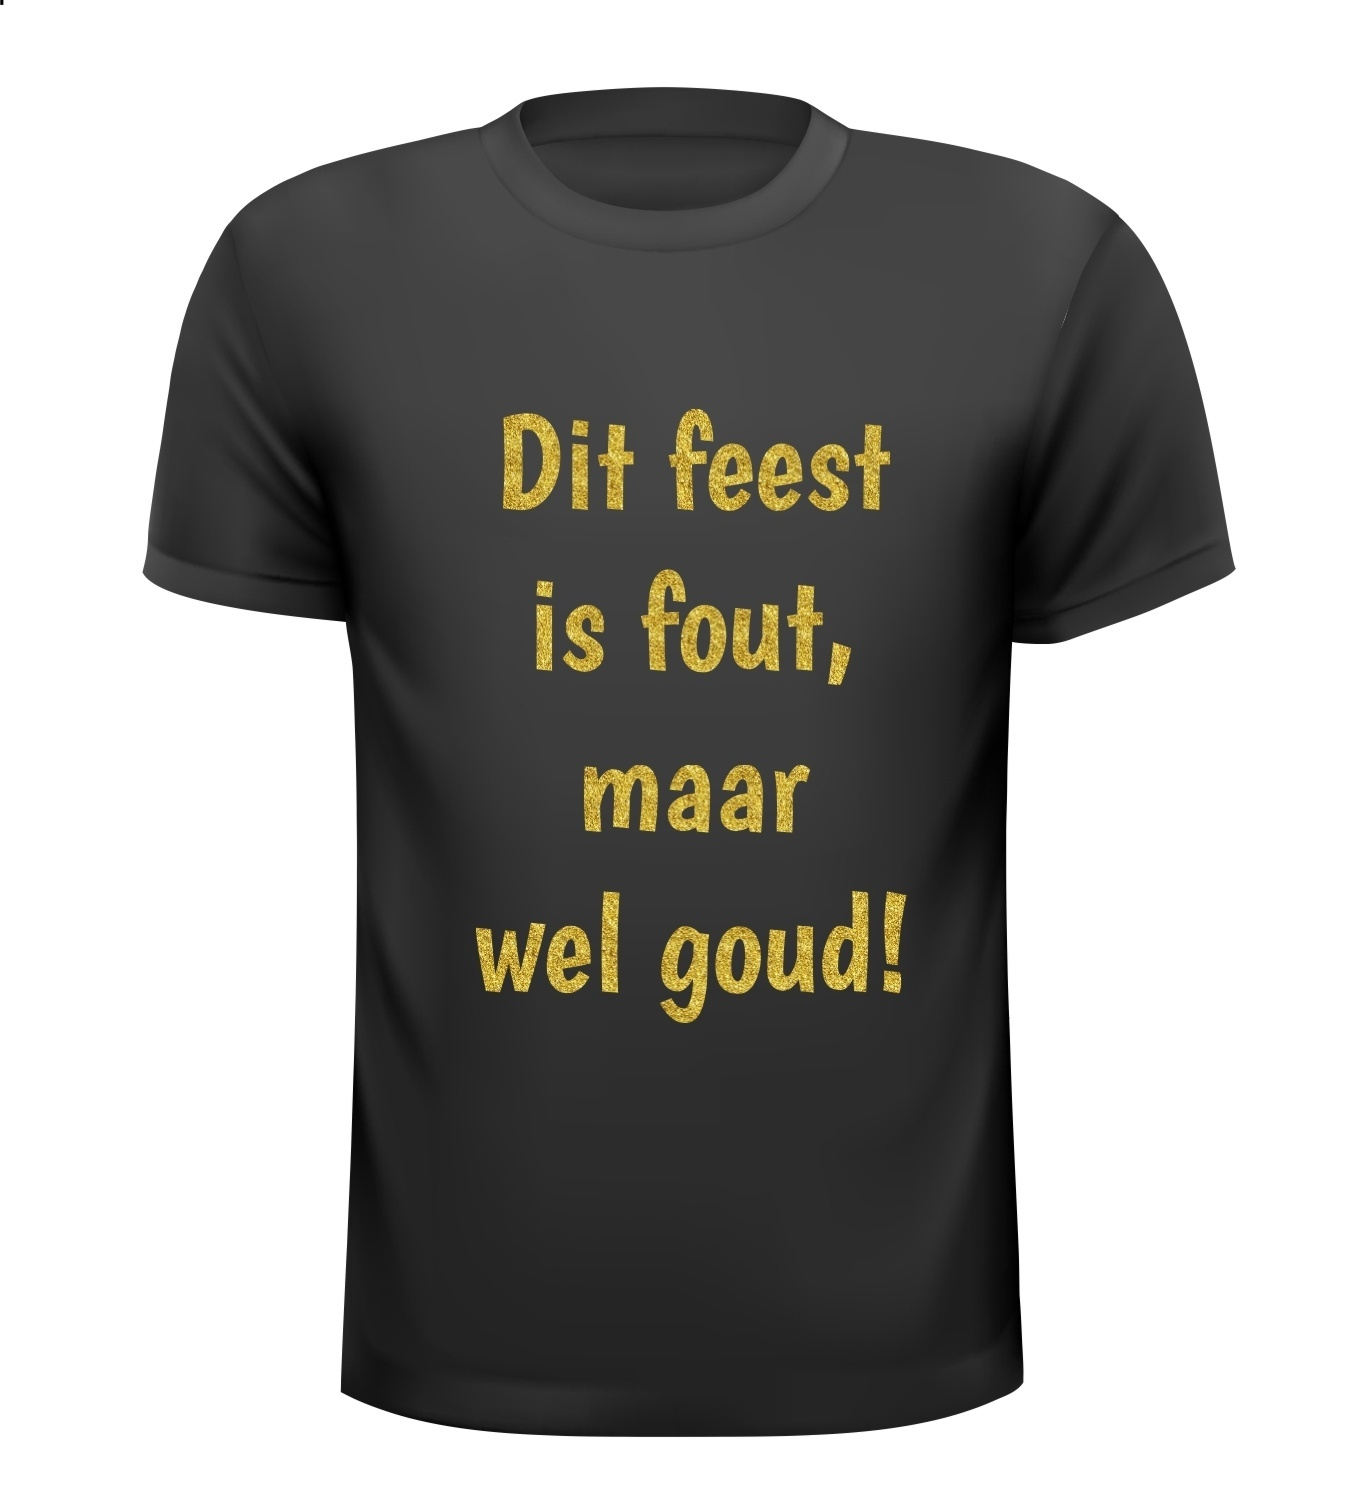 ab82edc30e335d T-shirt Dit feest is fout maar wel goud! glitter foute party